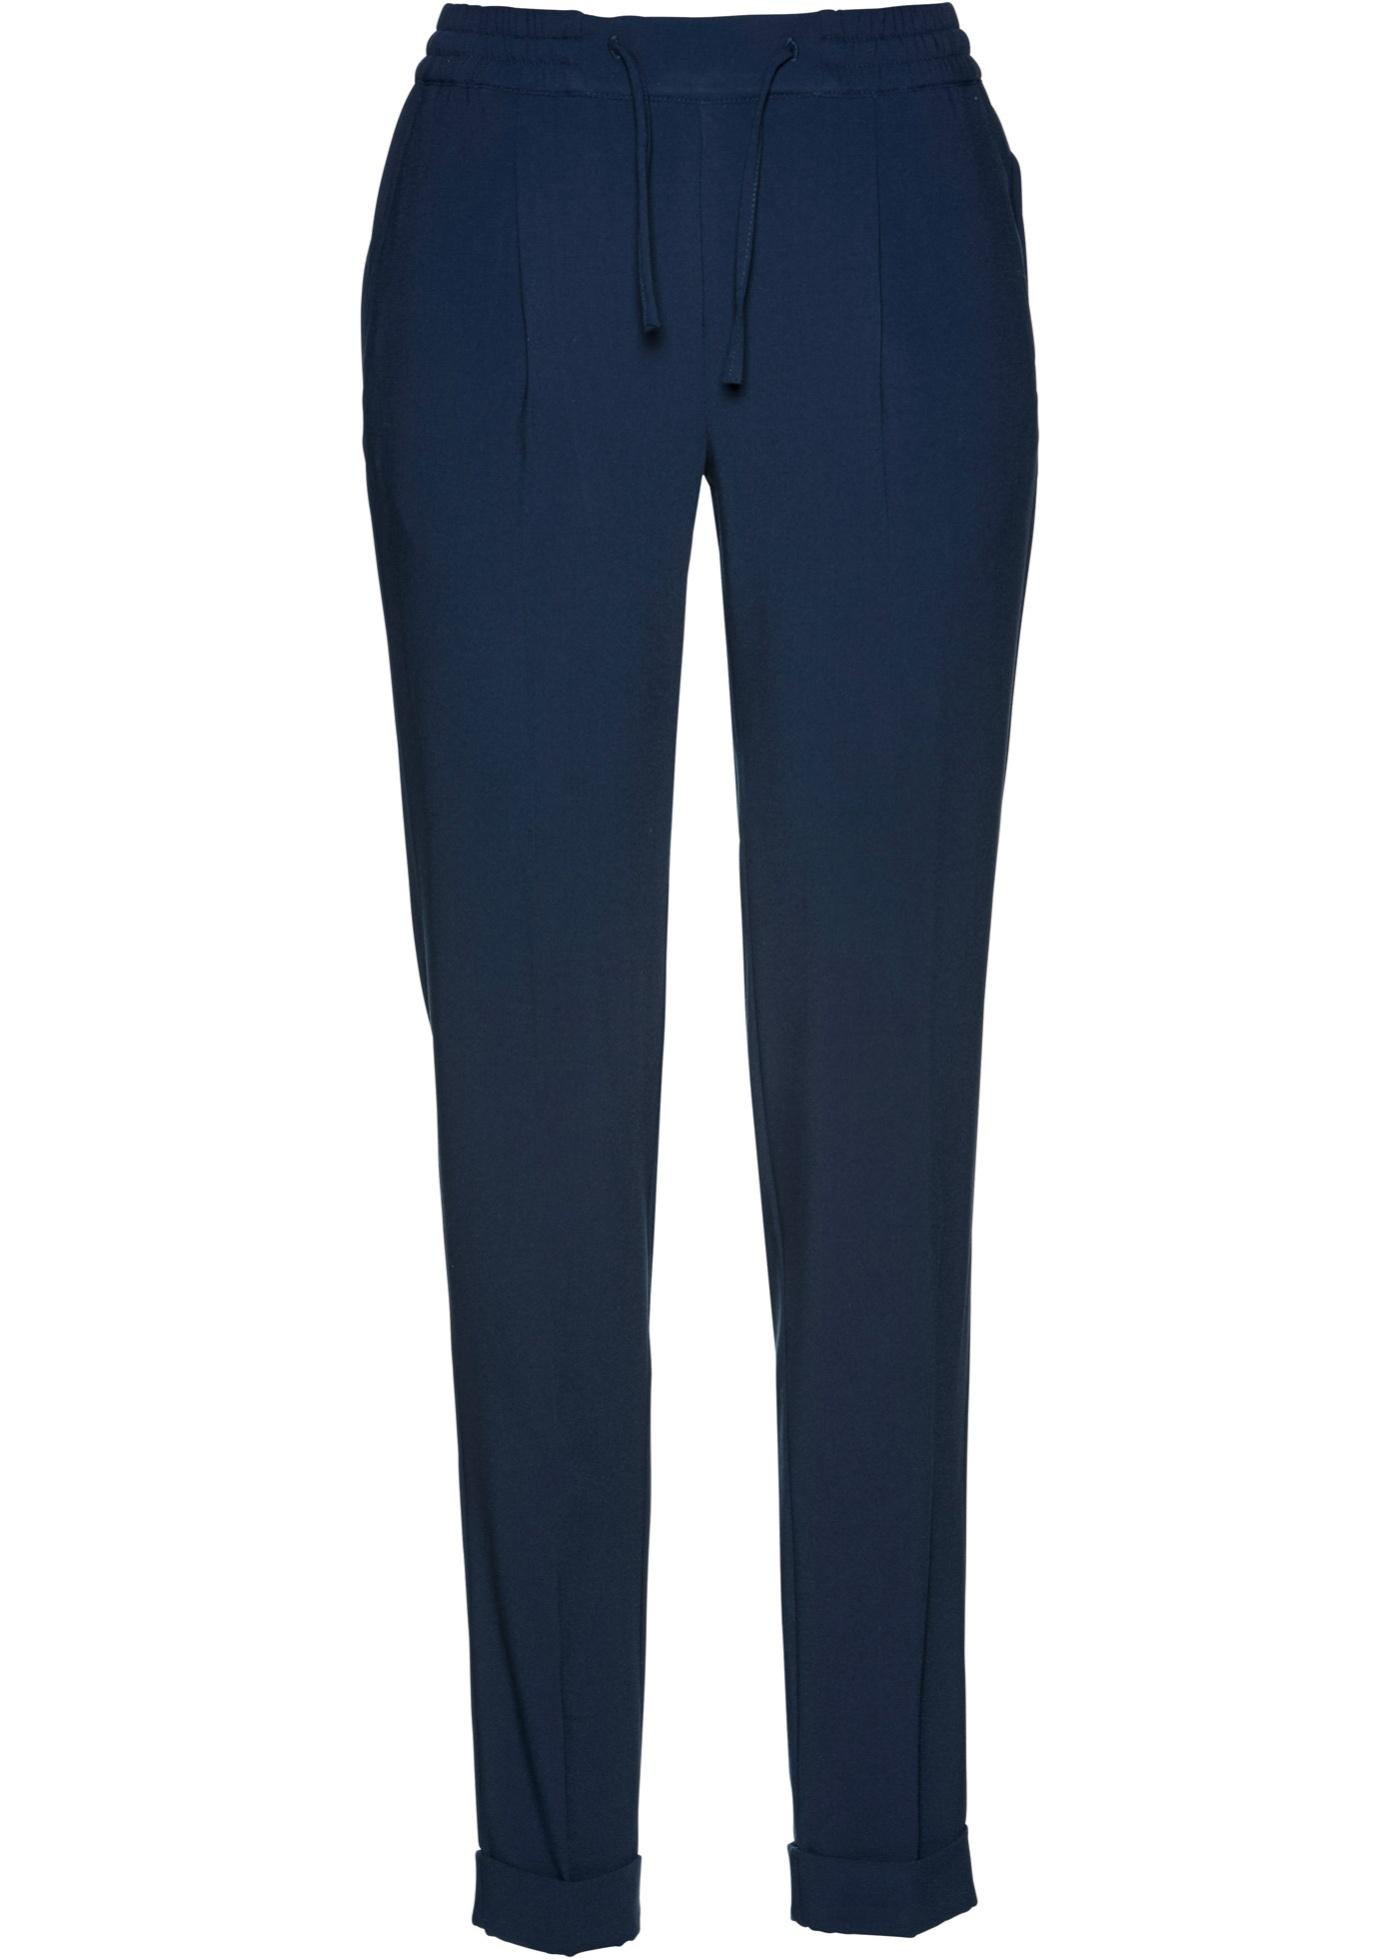 Kalhoty s průvlekem na gumu - Modrá